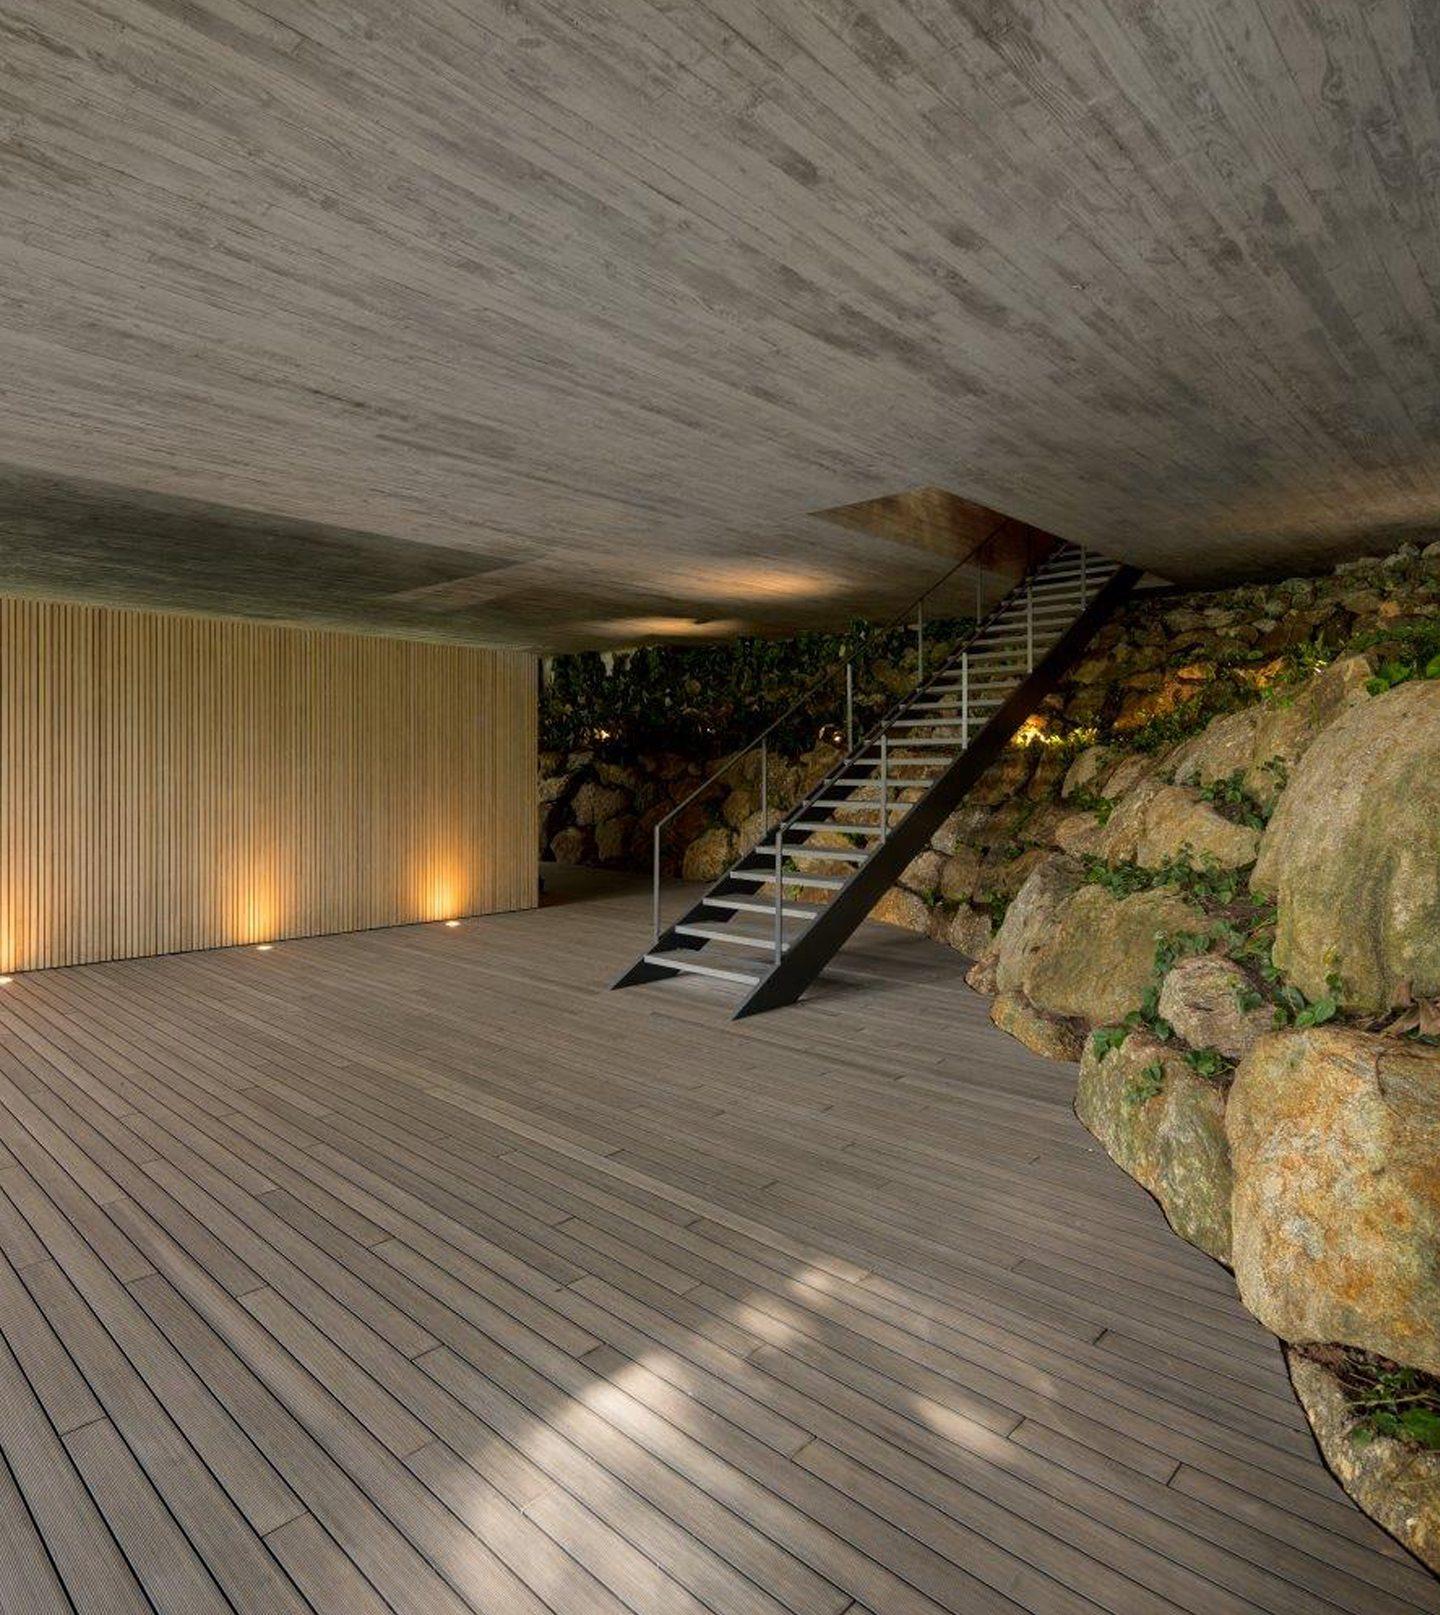 architecture_casanamata_studiomk27_06